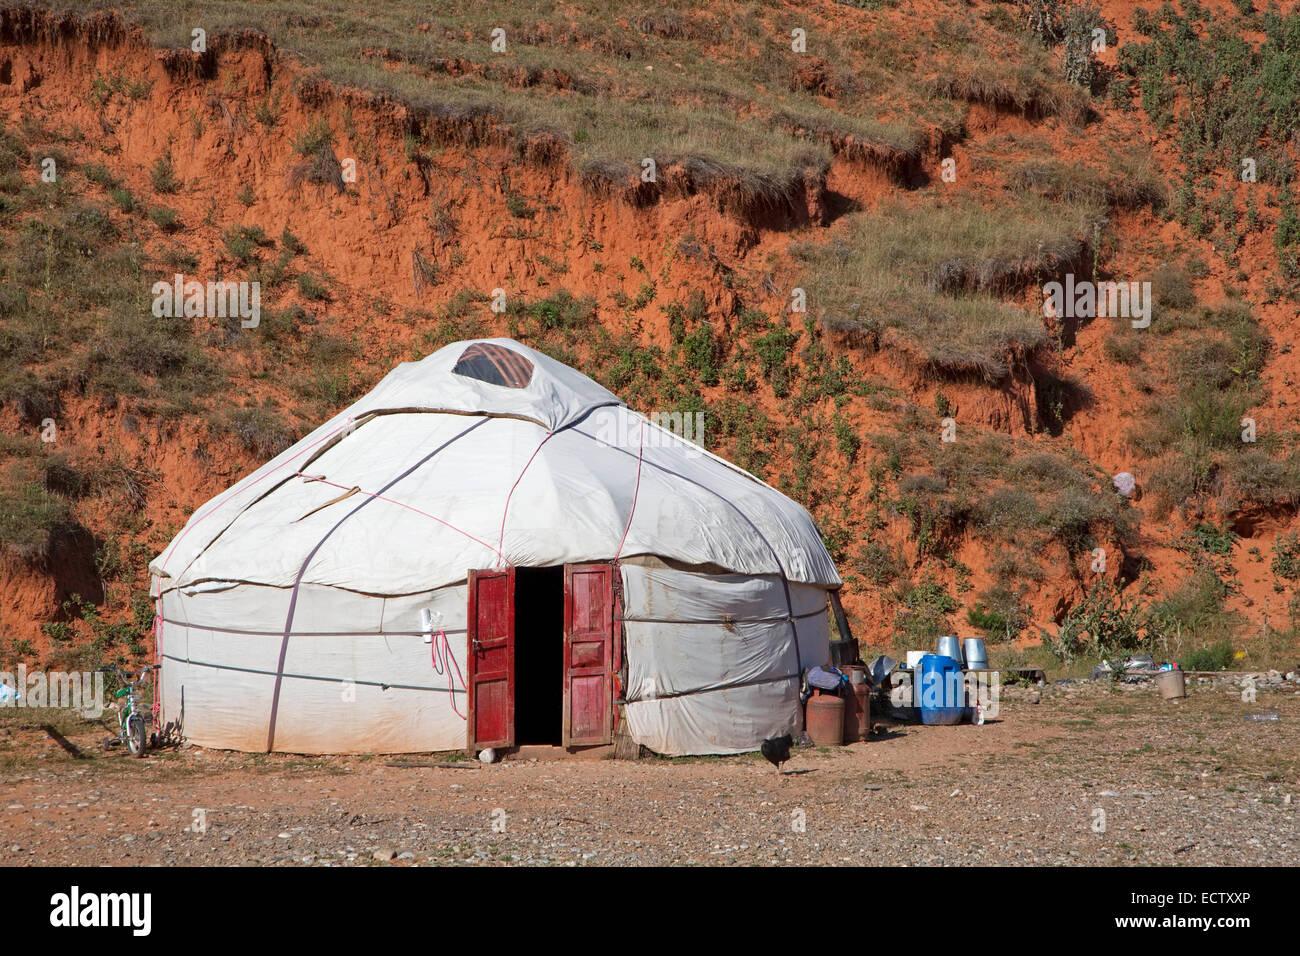 Kirgisische Jurte, temporäre Sommer Nomaden wohnen in den Bergen in der Provinz Osch, Kirgisistan Stockbild